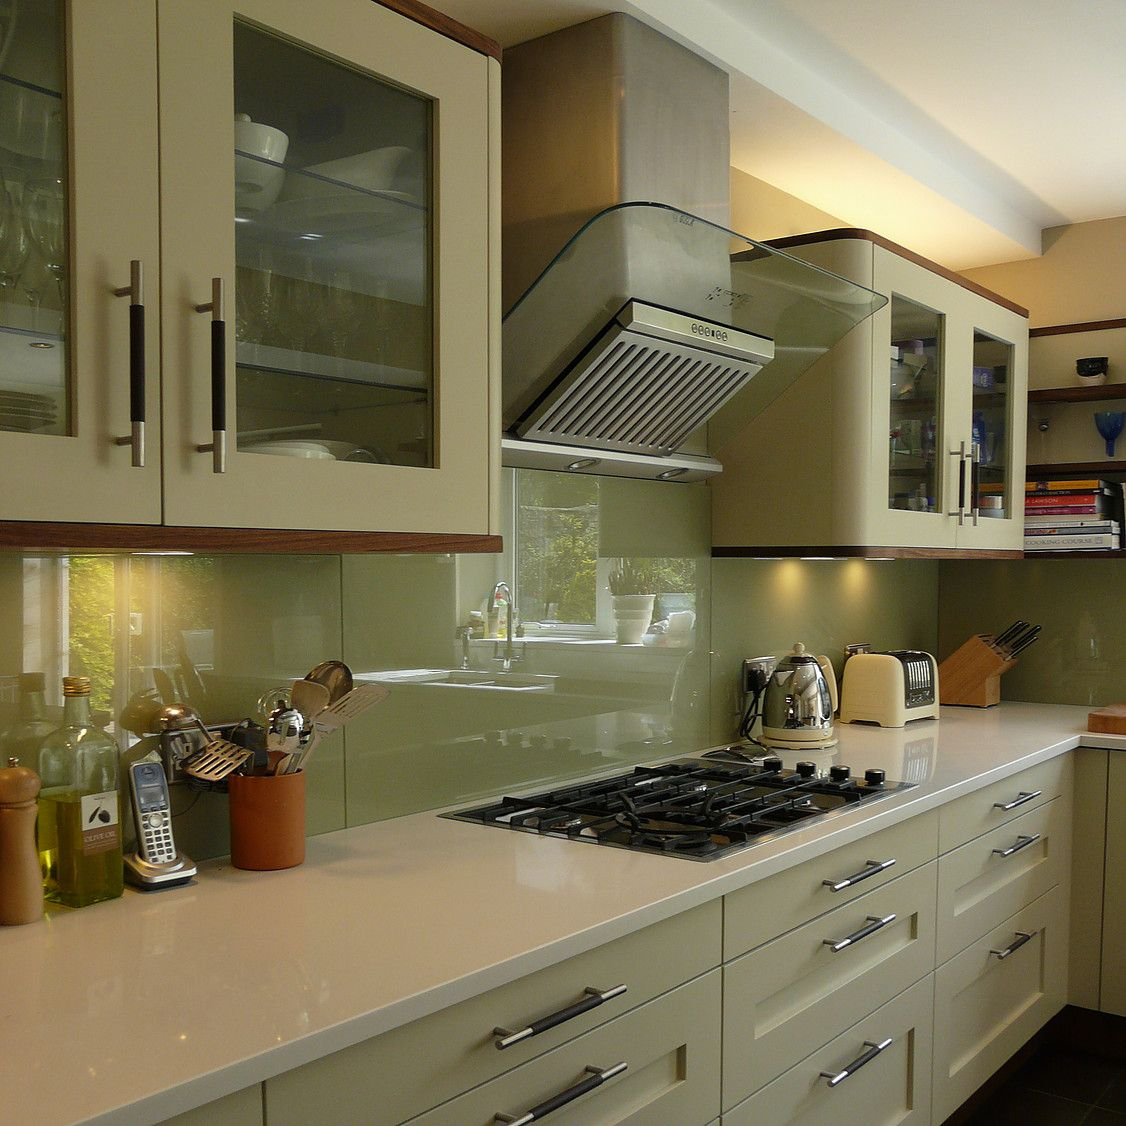 Bespoke Traditional Kitchen Design in Bristol, Burford, Battersea ...